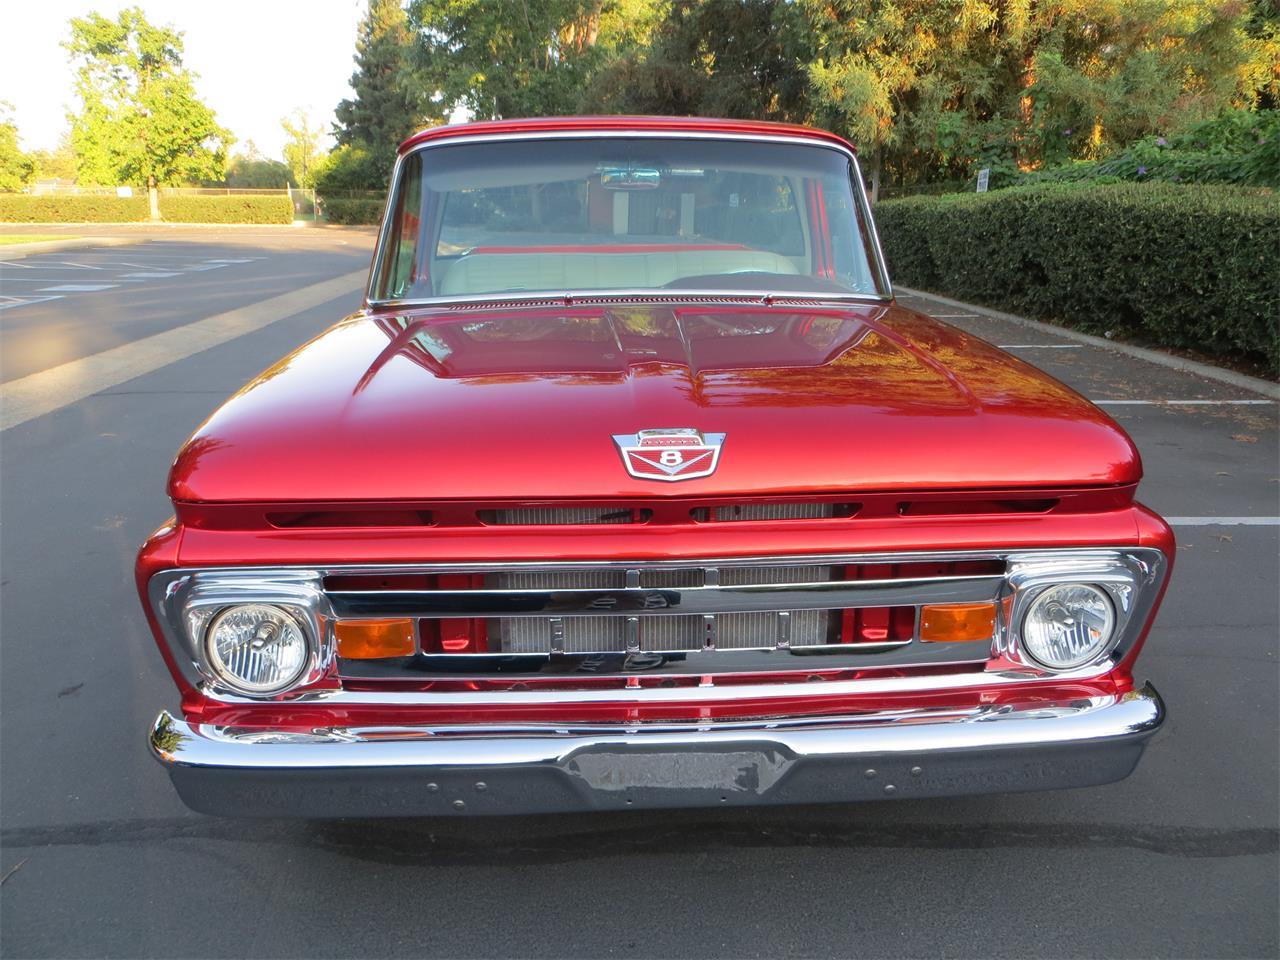 Future Ford Of Sacramento >> 1962 Ford F100 for Sale | ClassicCars.com | CC-1023043